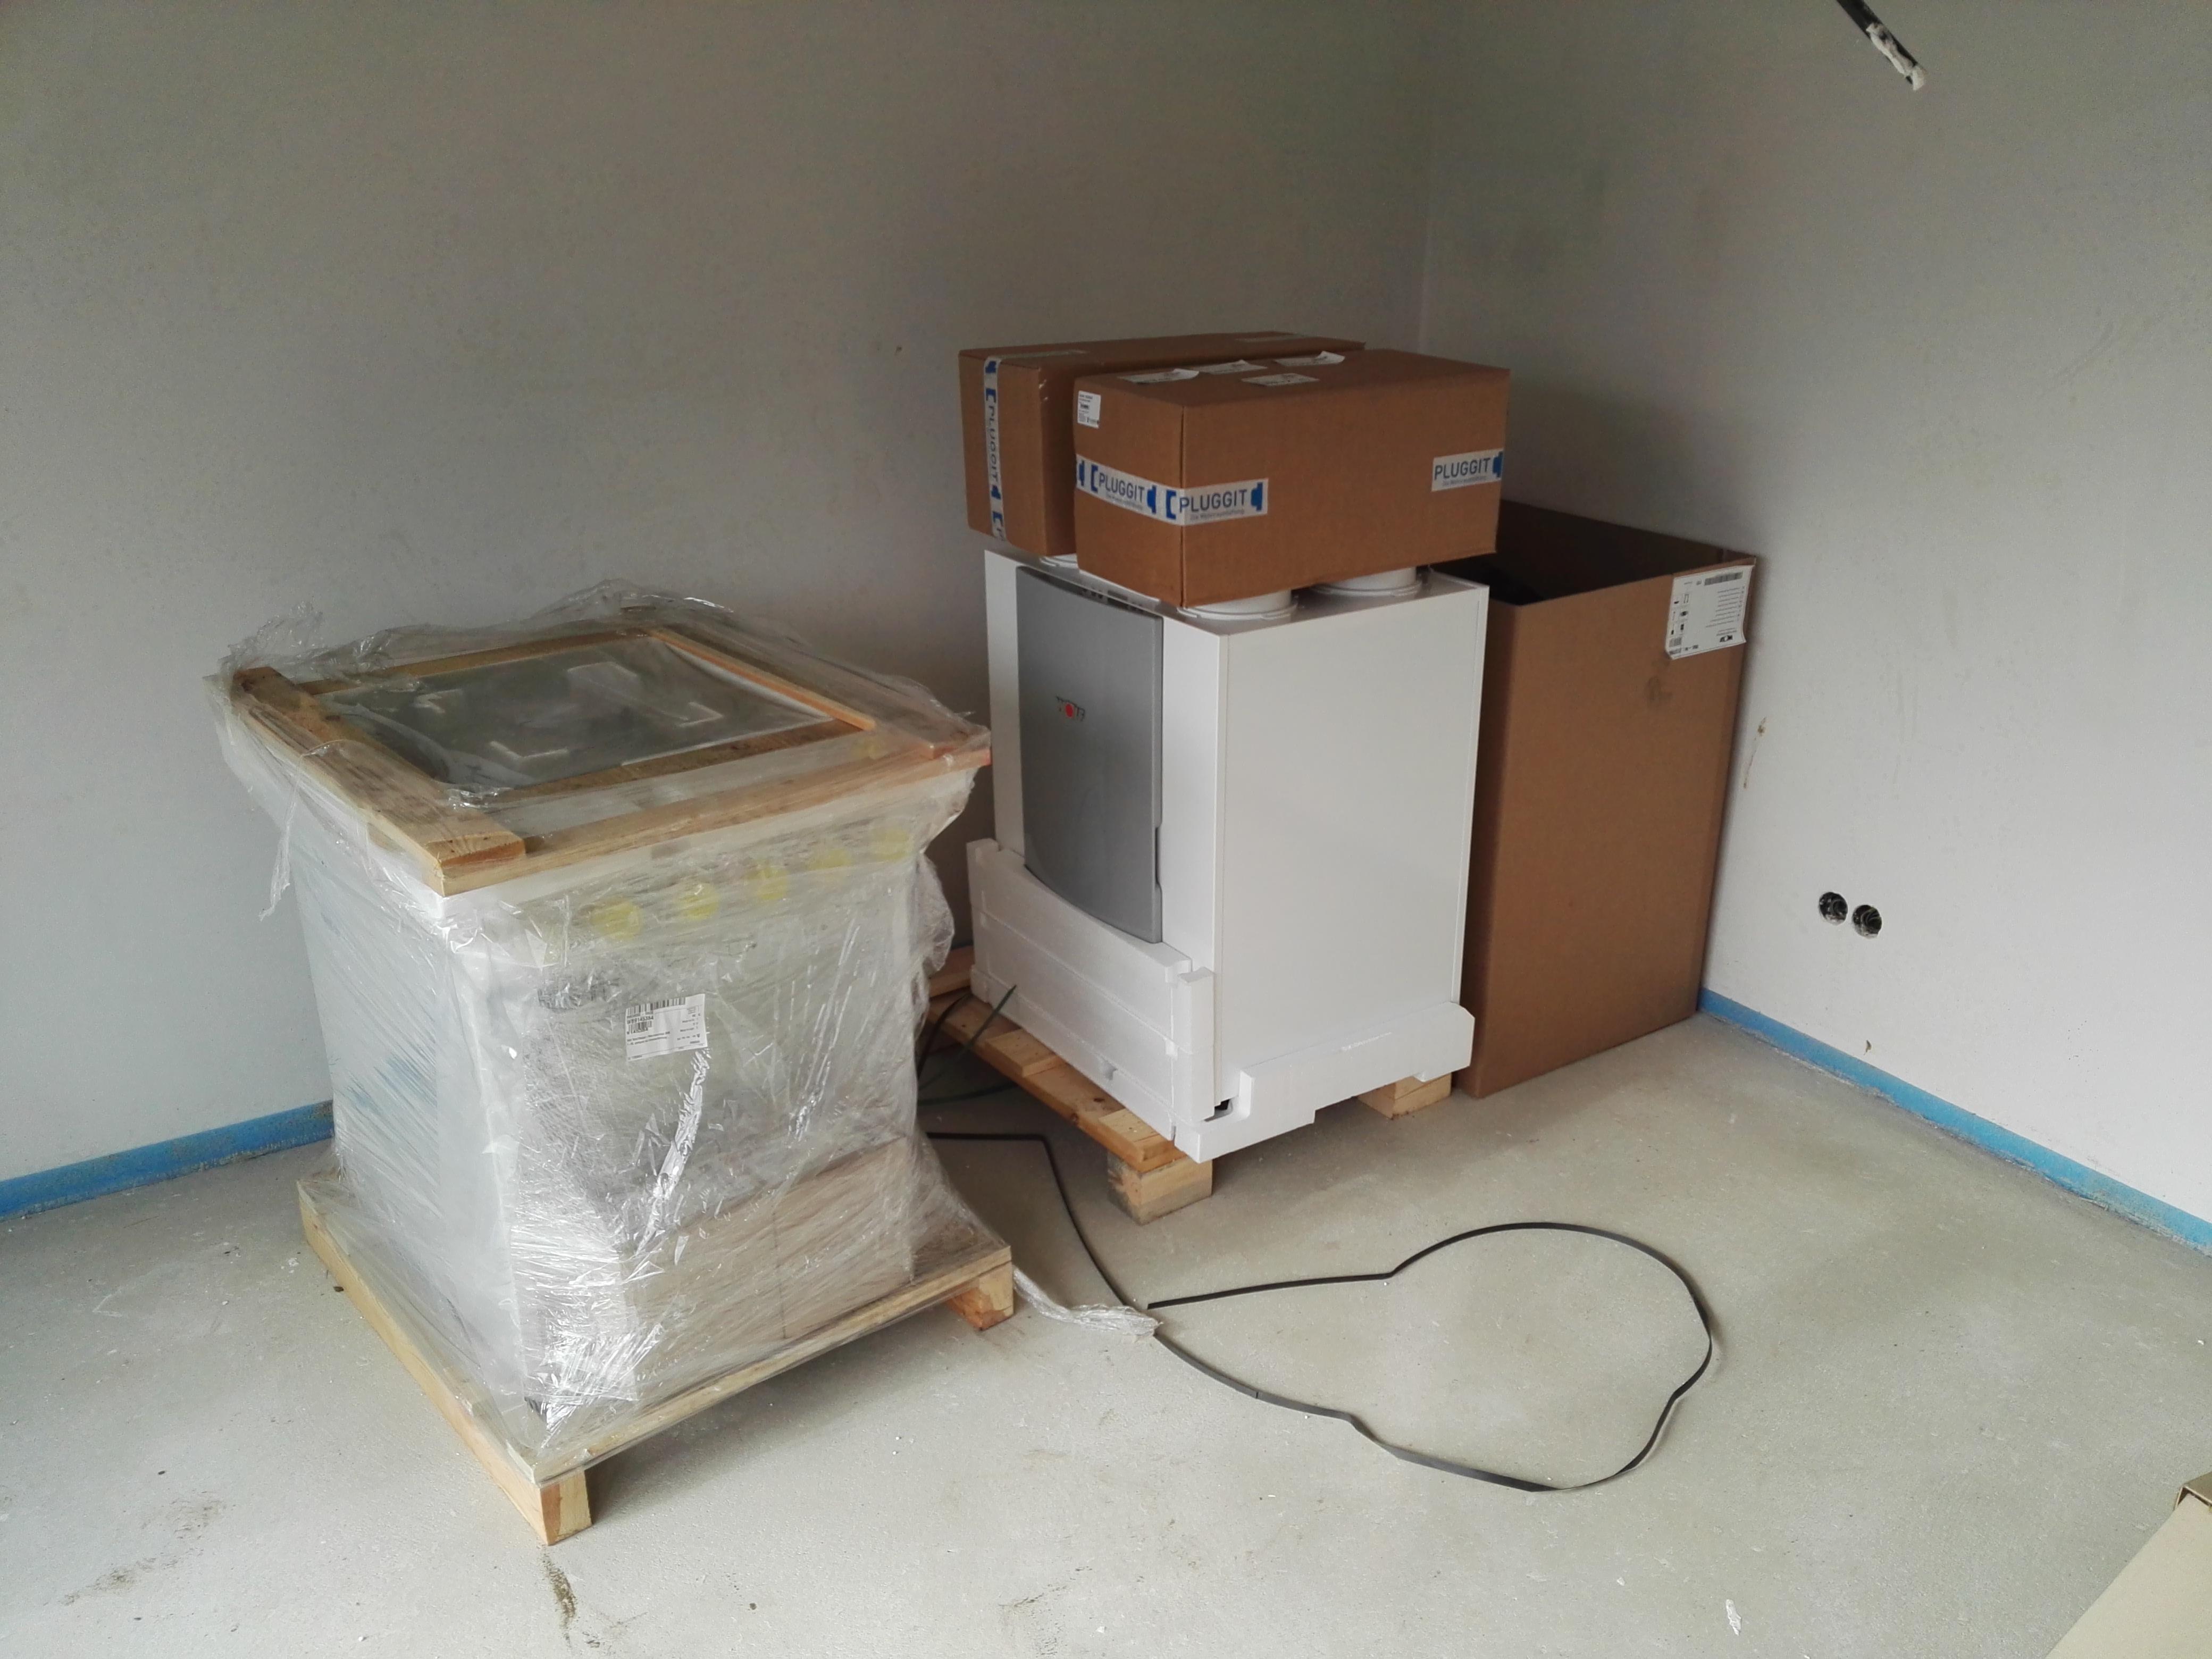 haustechnik nurda efh in algermissen. Black Bedroom Furniture Sets. Home Design Ideas